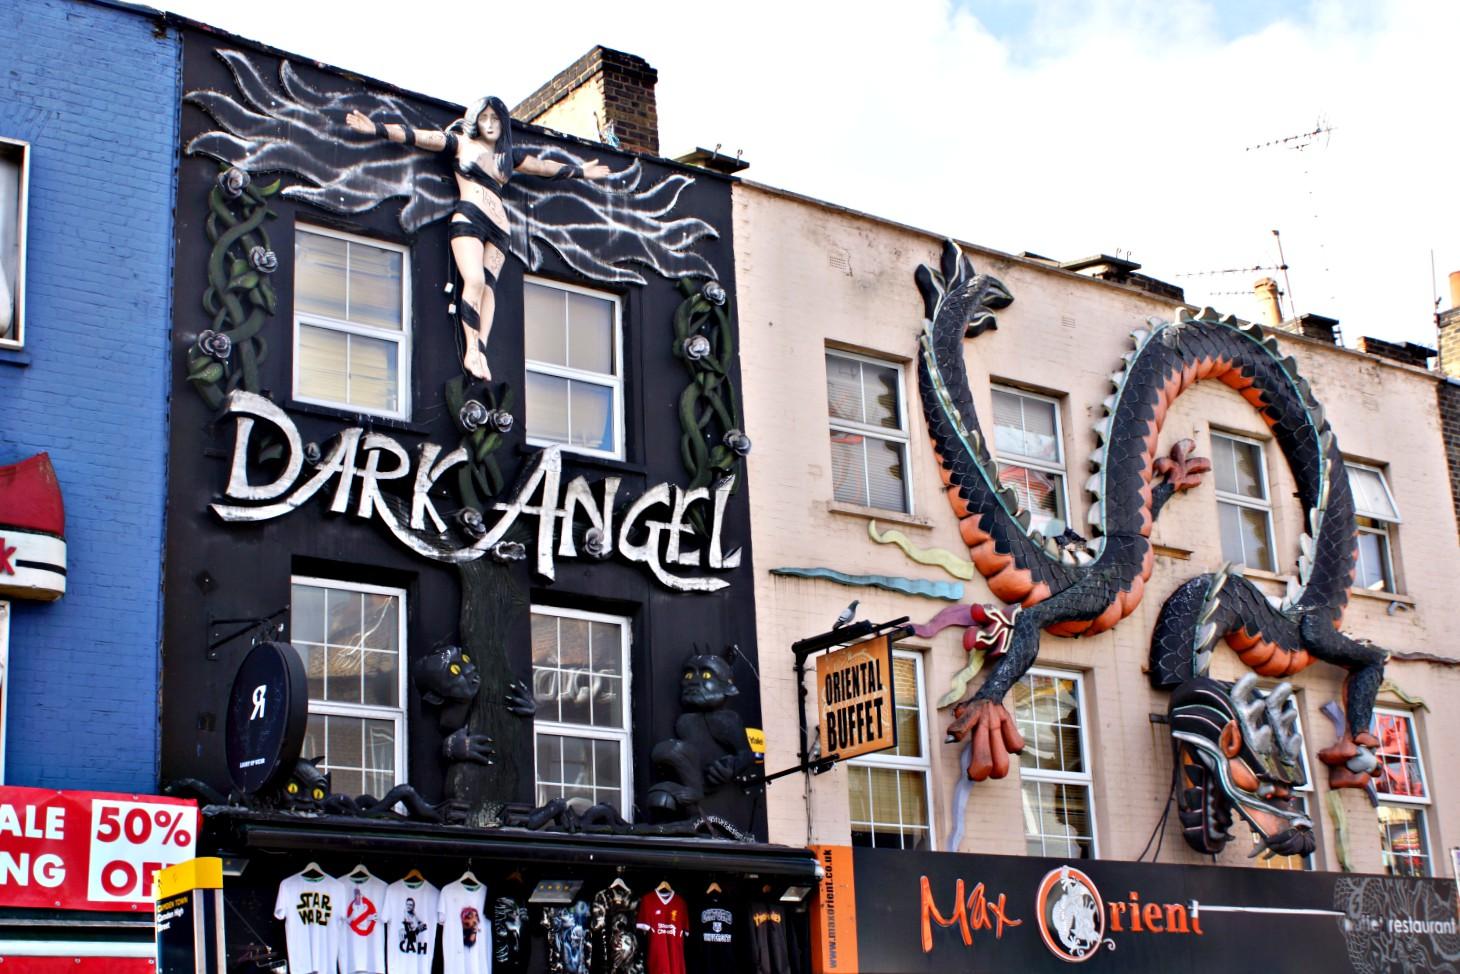 Camden Dark Angel